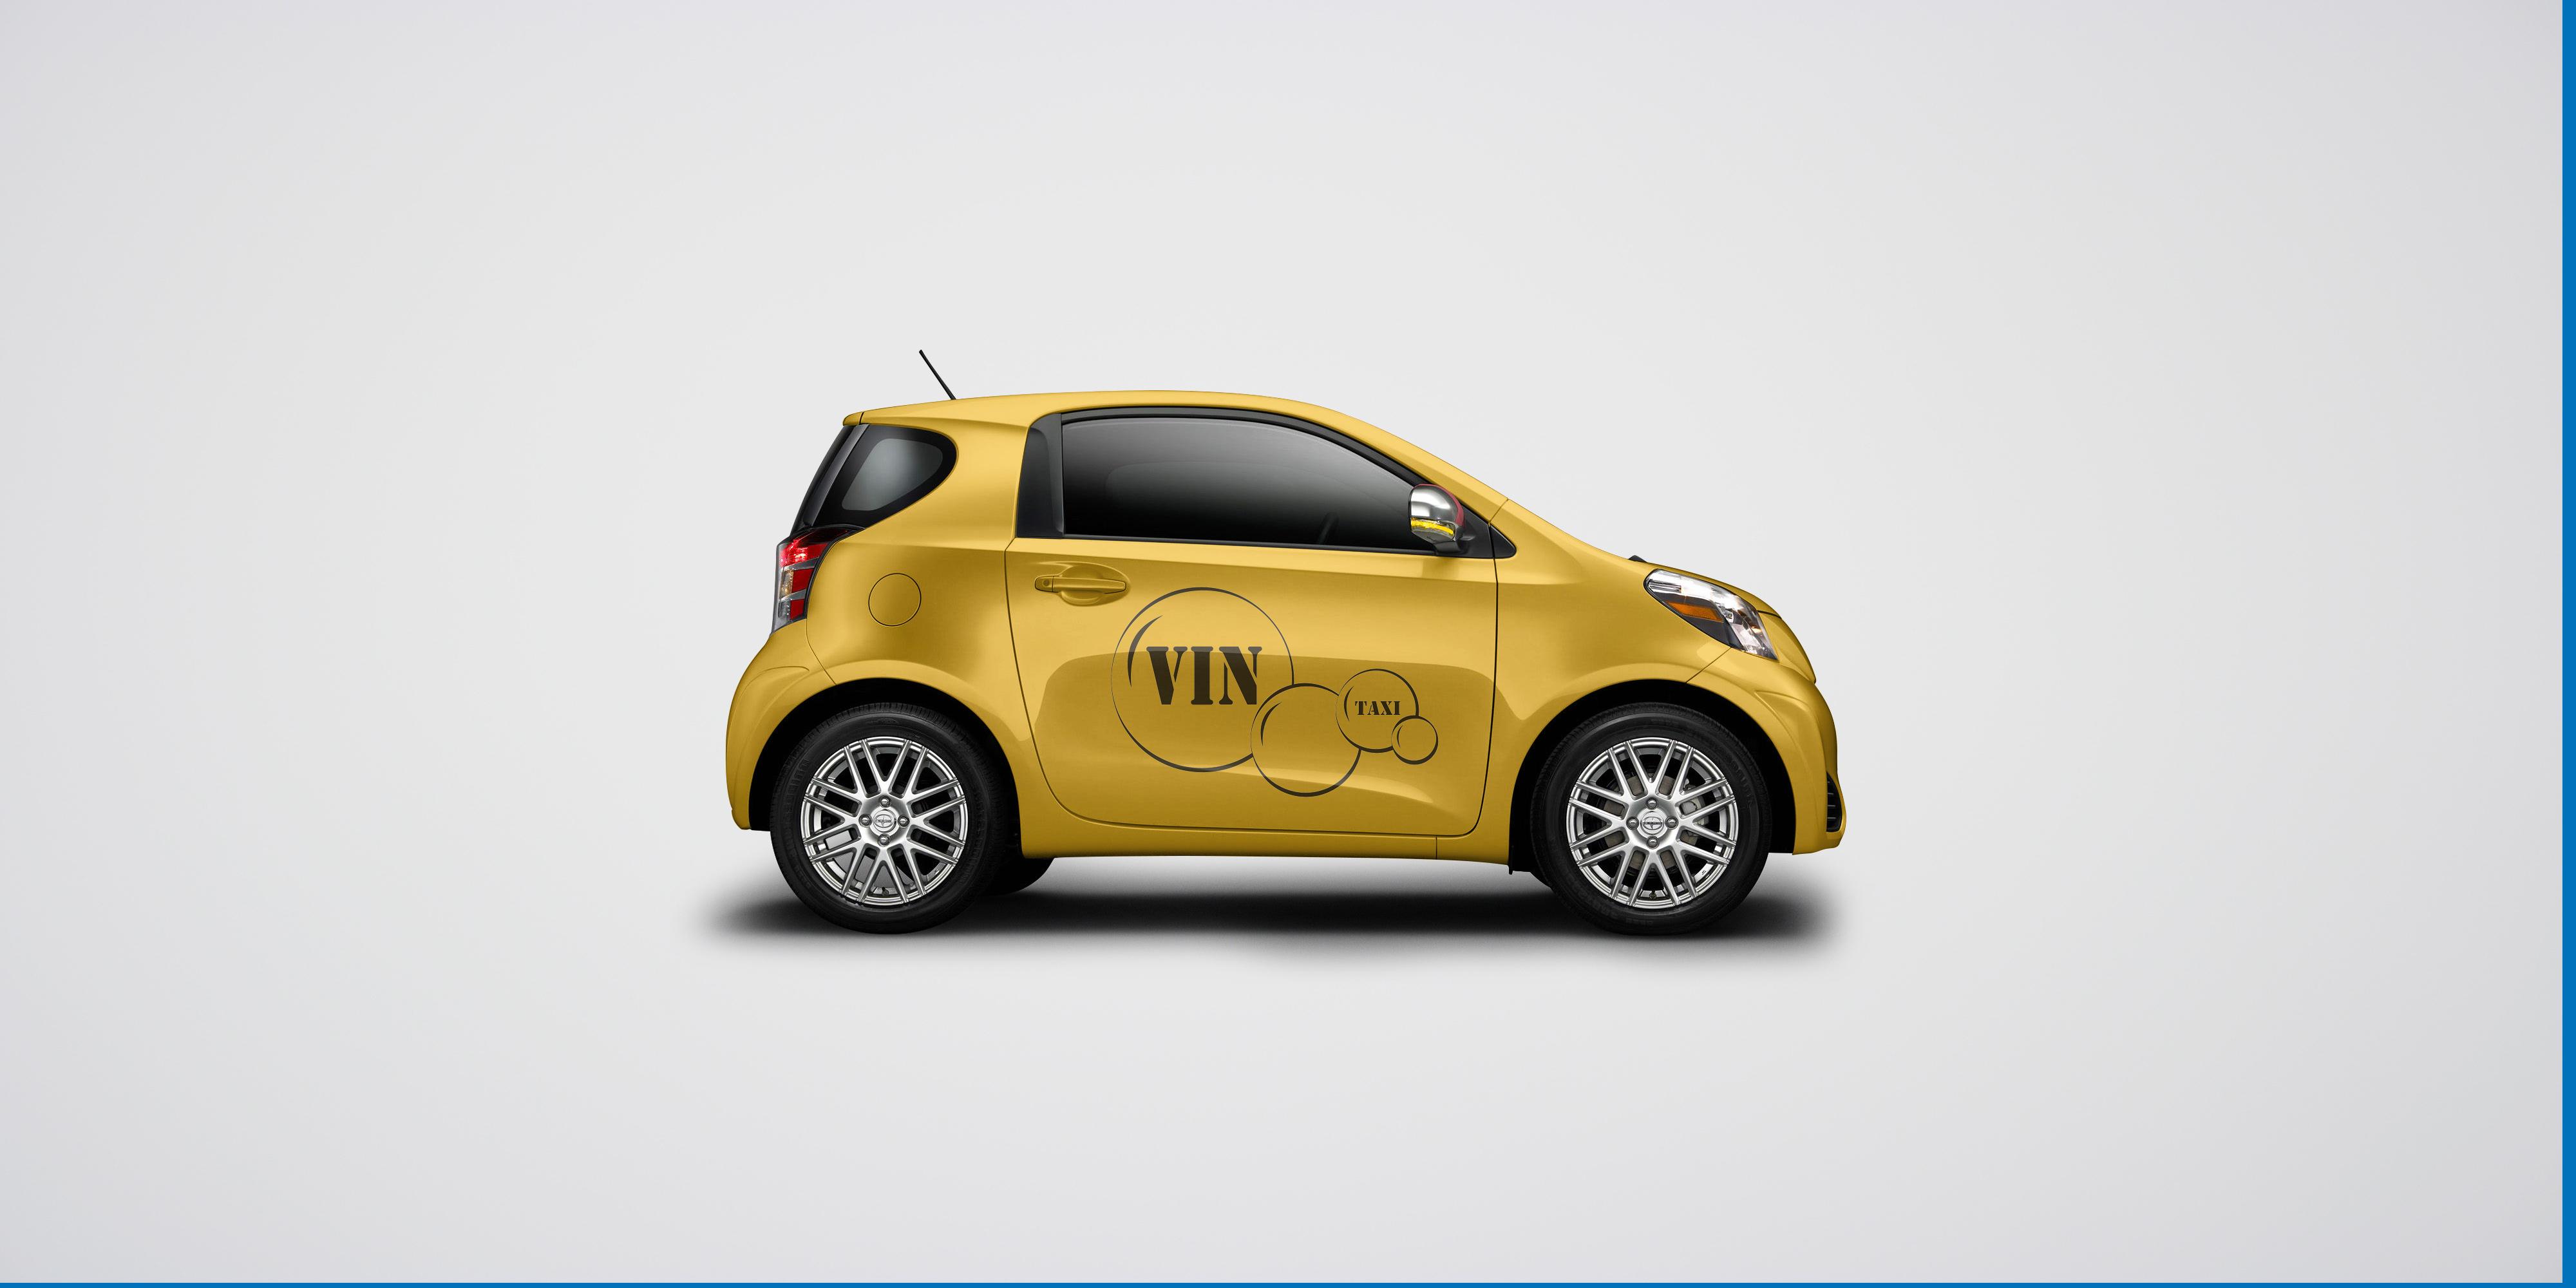 Разработка логотипа и фирменного стиля для такси фото f_4375b9eb92d09093.jpg